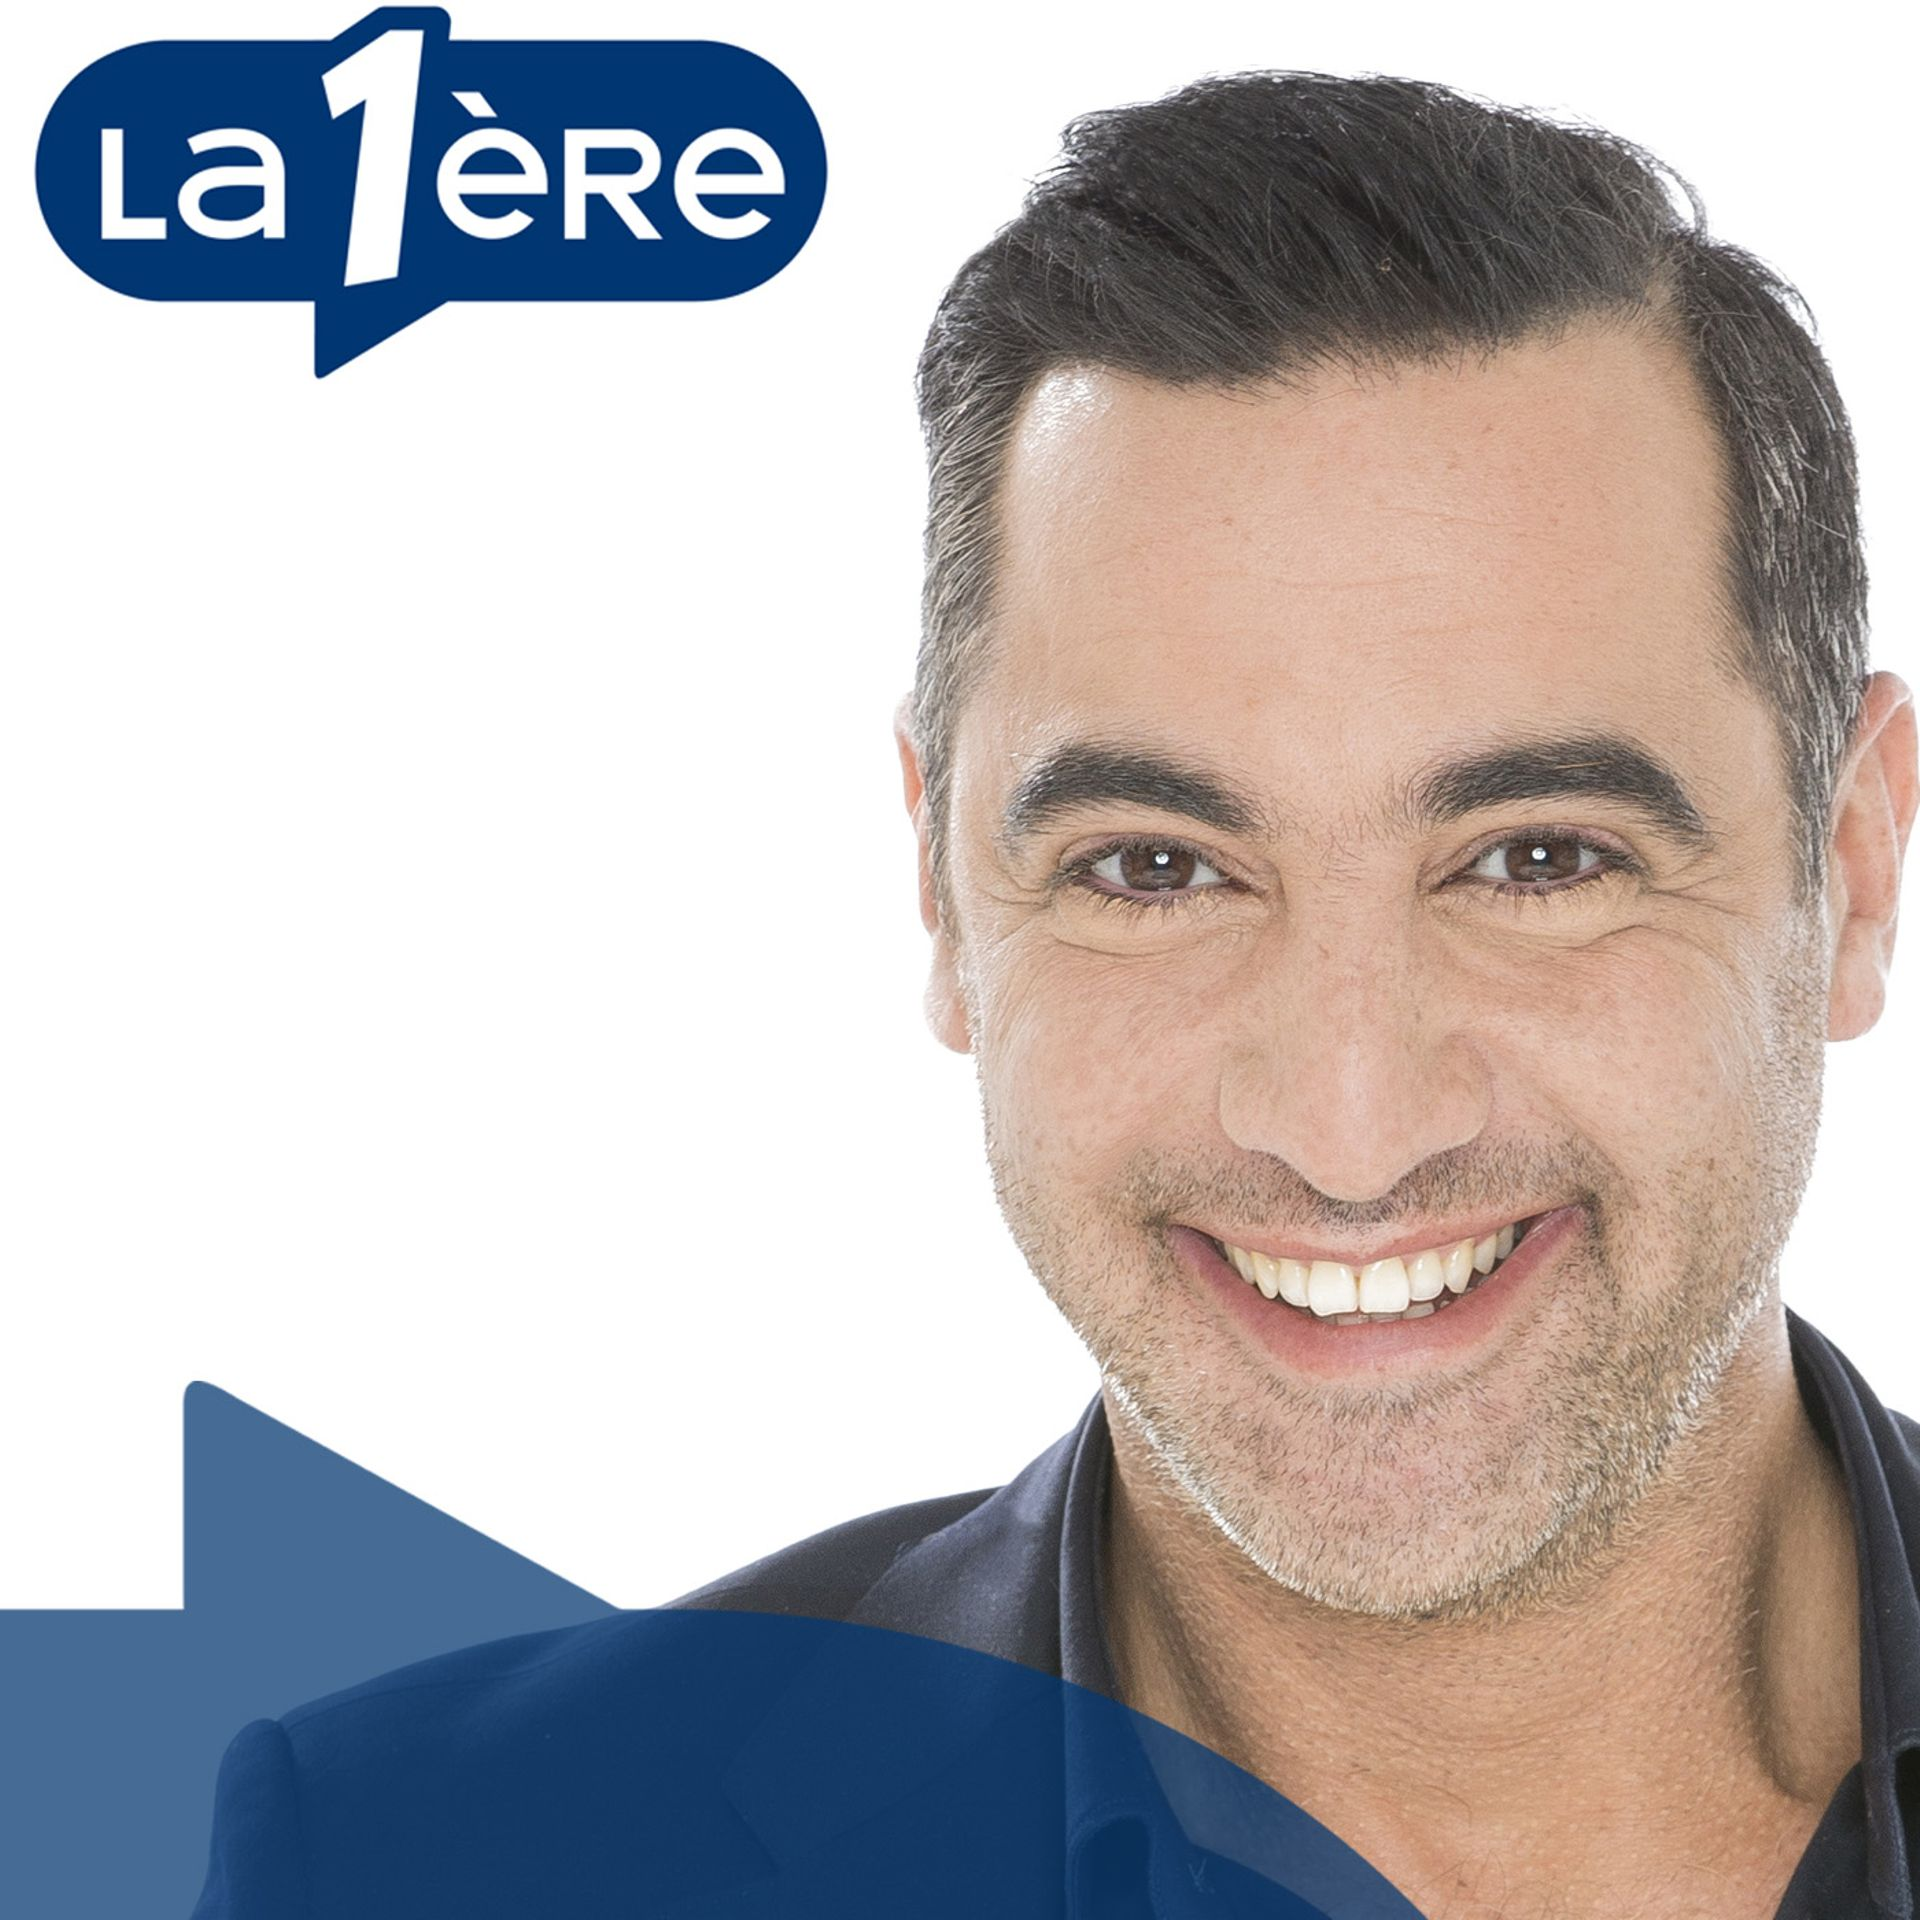 La Presque Star - Igor Lassist pour Pia la Poule - 02/07/2018